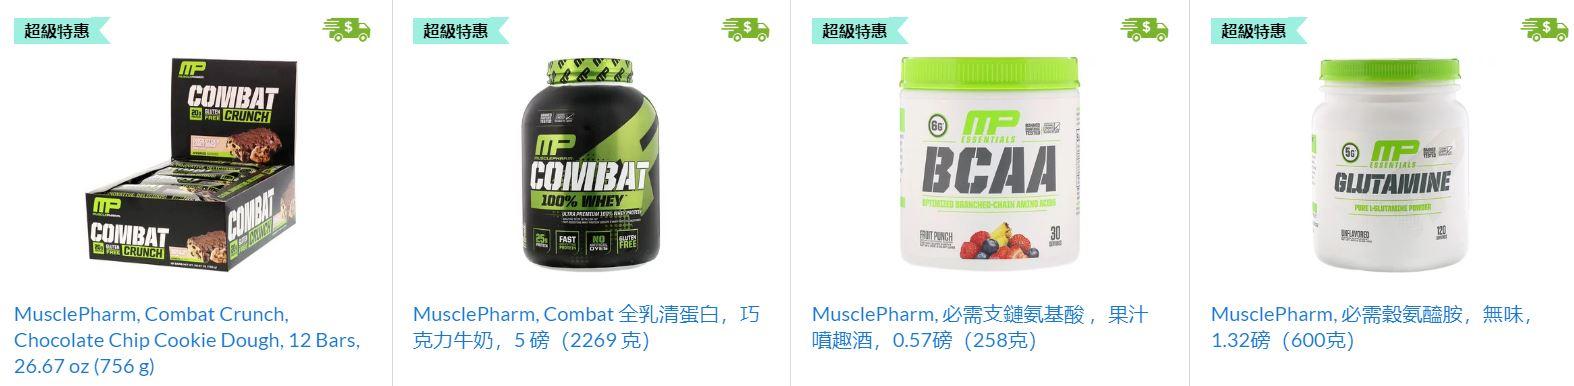 sport nutrient 健康補充劑